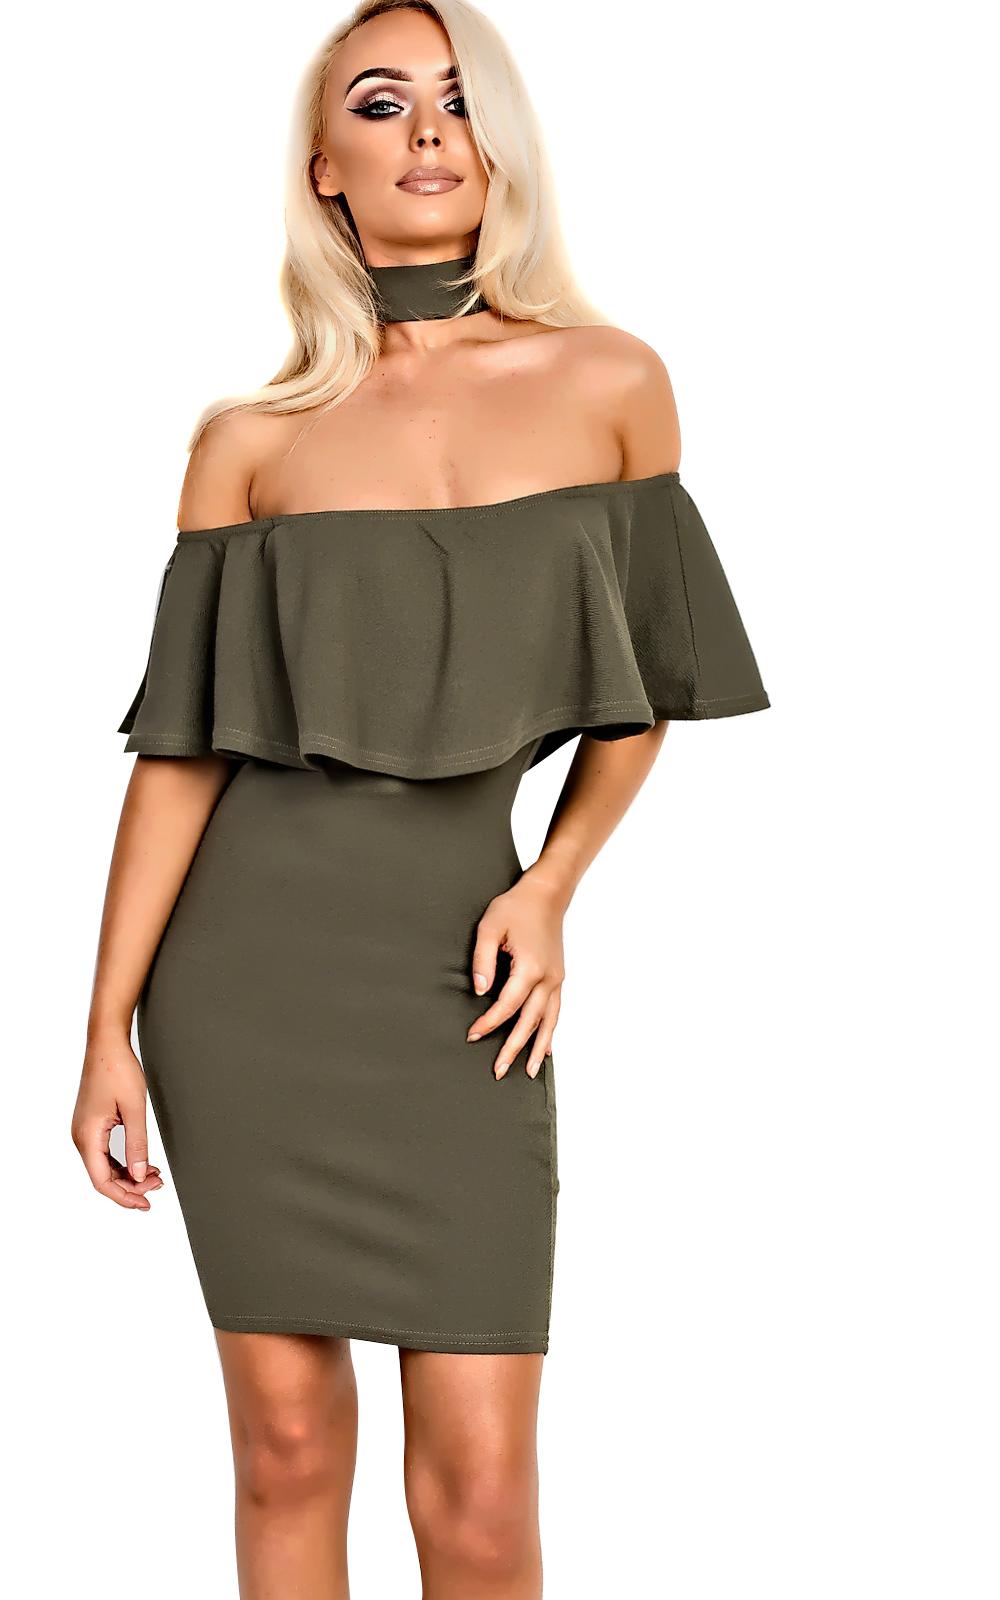 IKRUSH-Womens-Kassidy-Choker-Neck-Bodycon-Dress